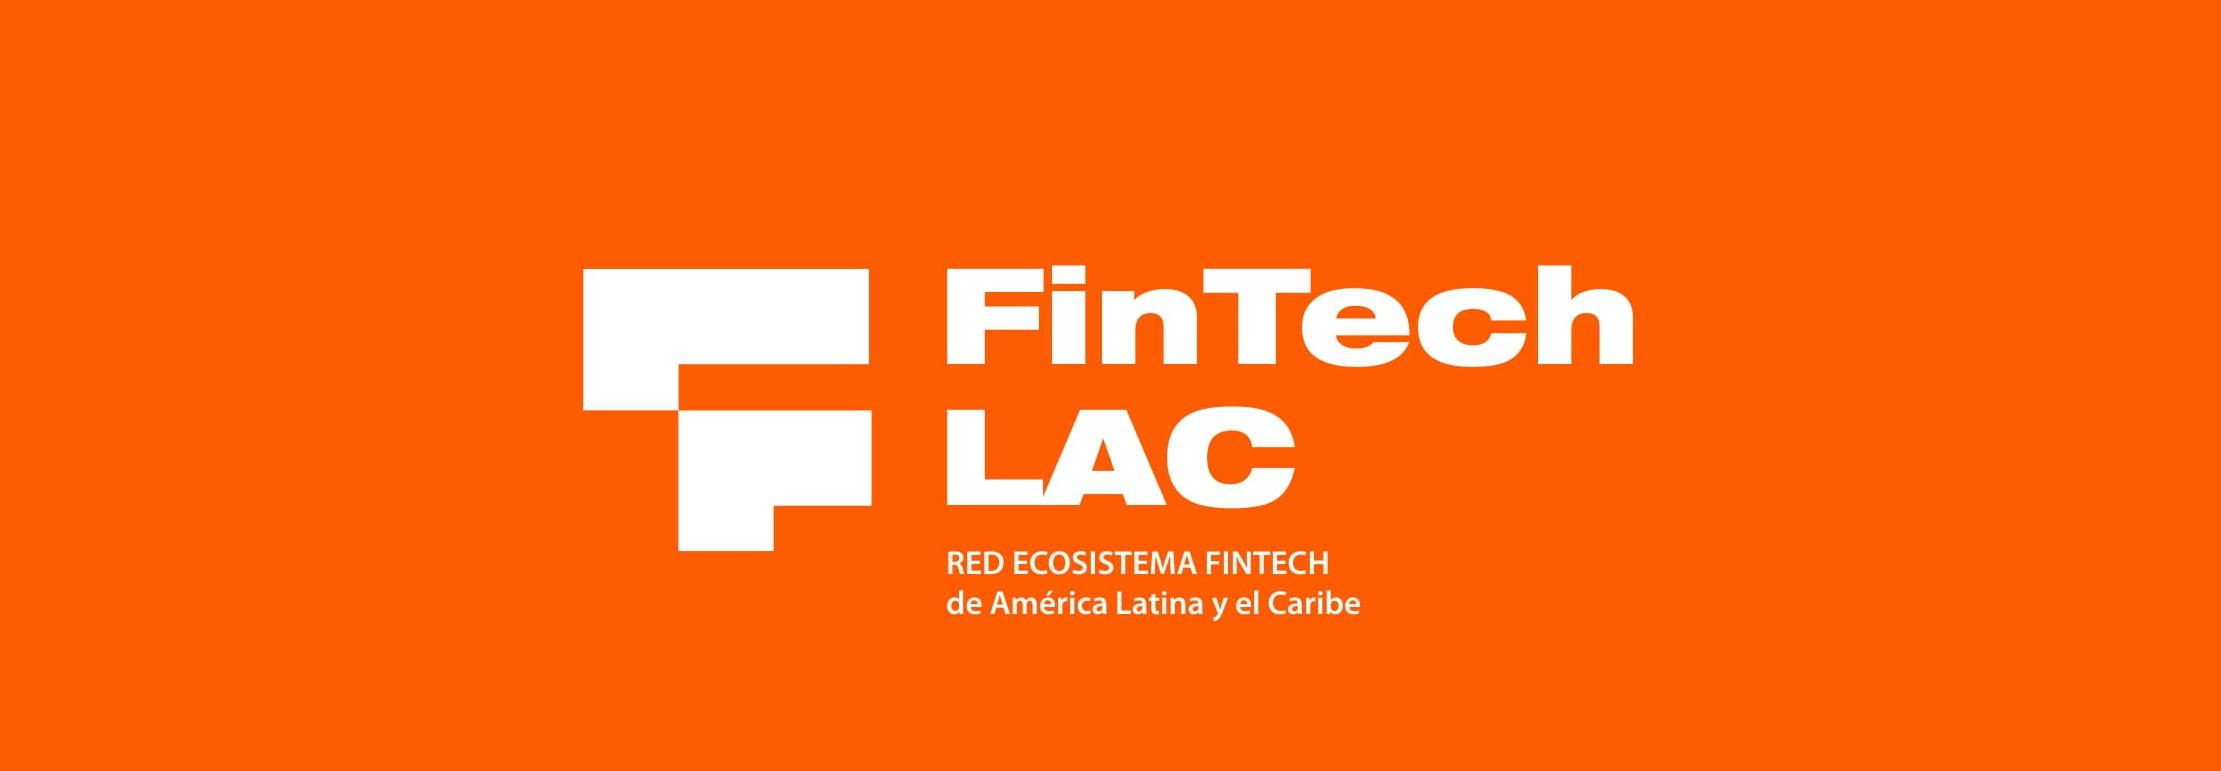 FintechLAC-Banner